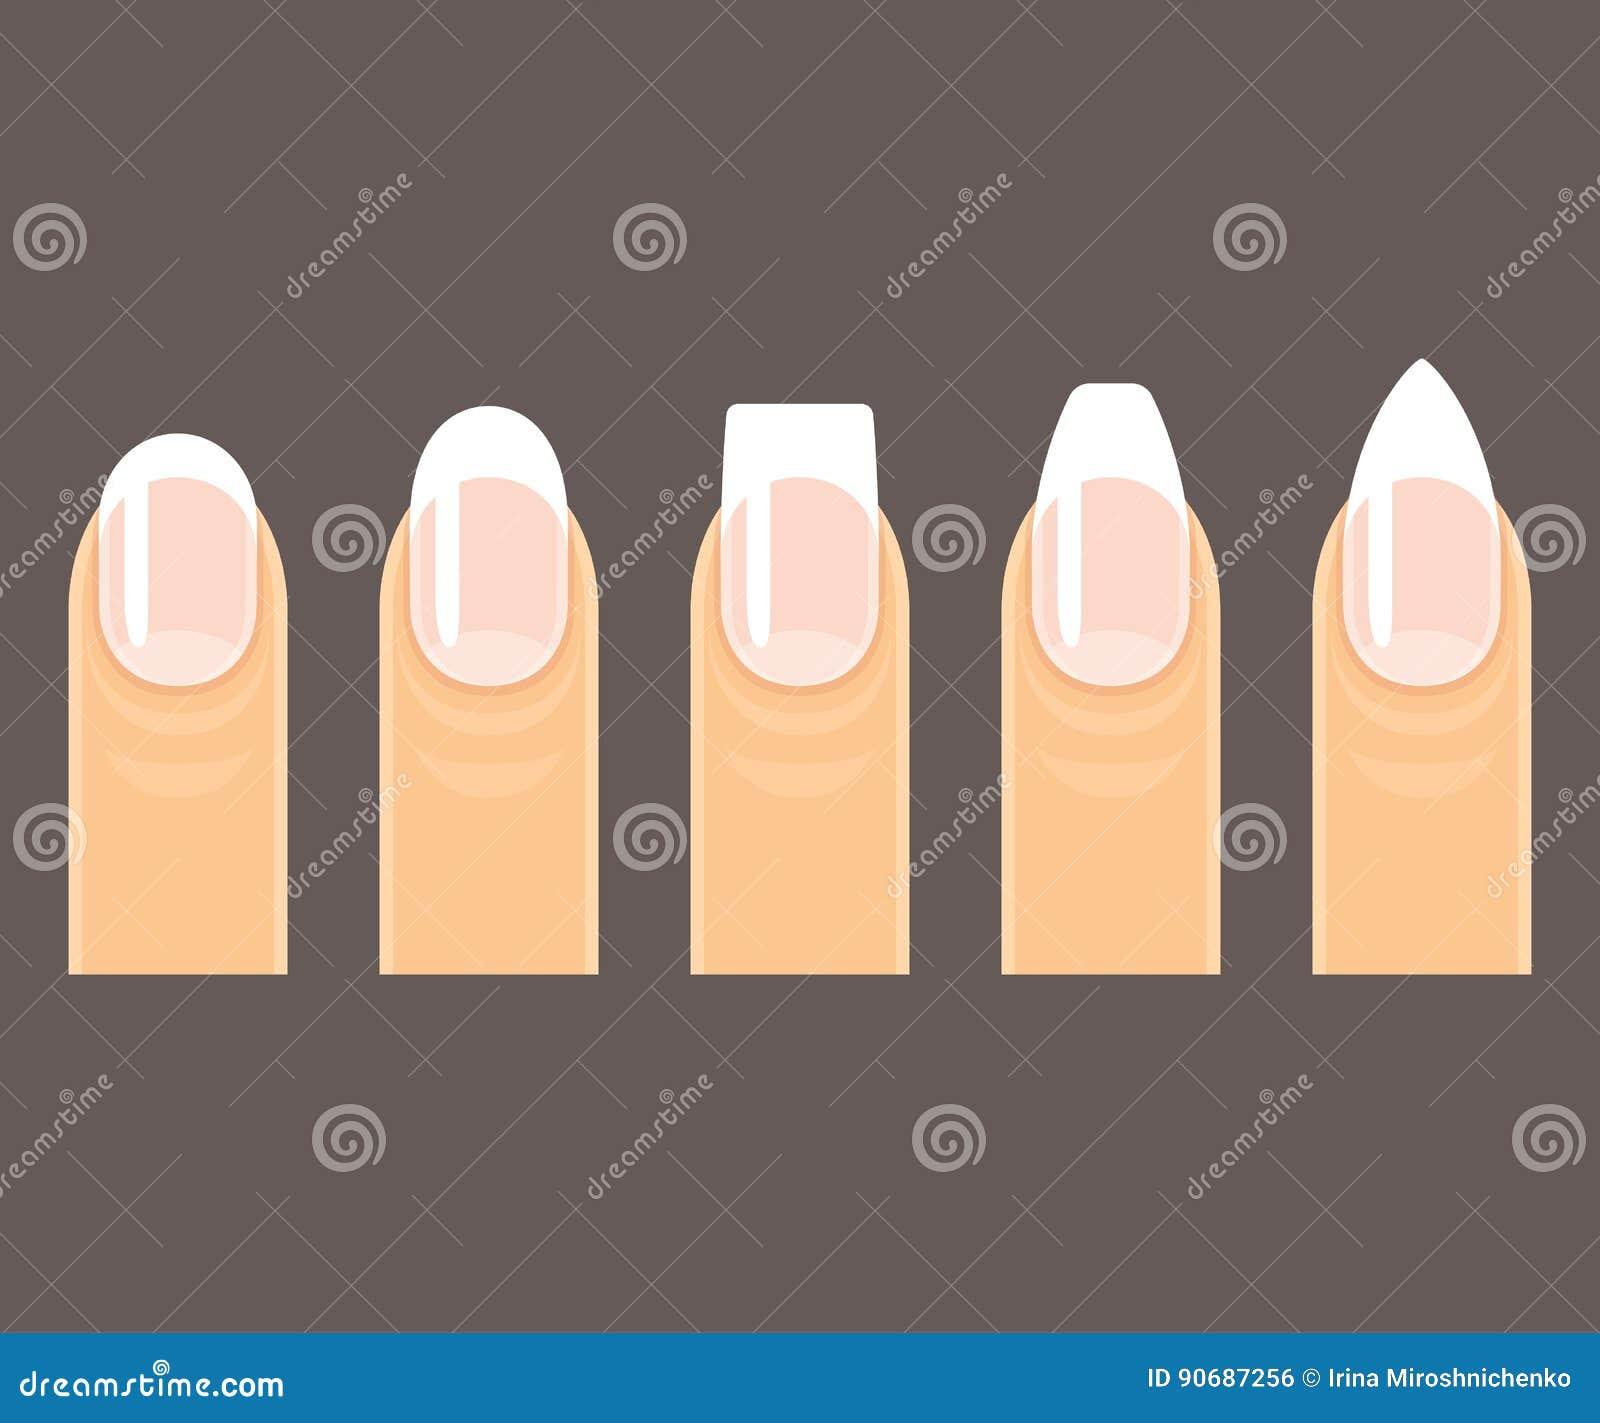 Manicure nail shapes stock vector. Illustration of nail - 90687256